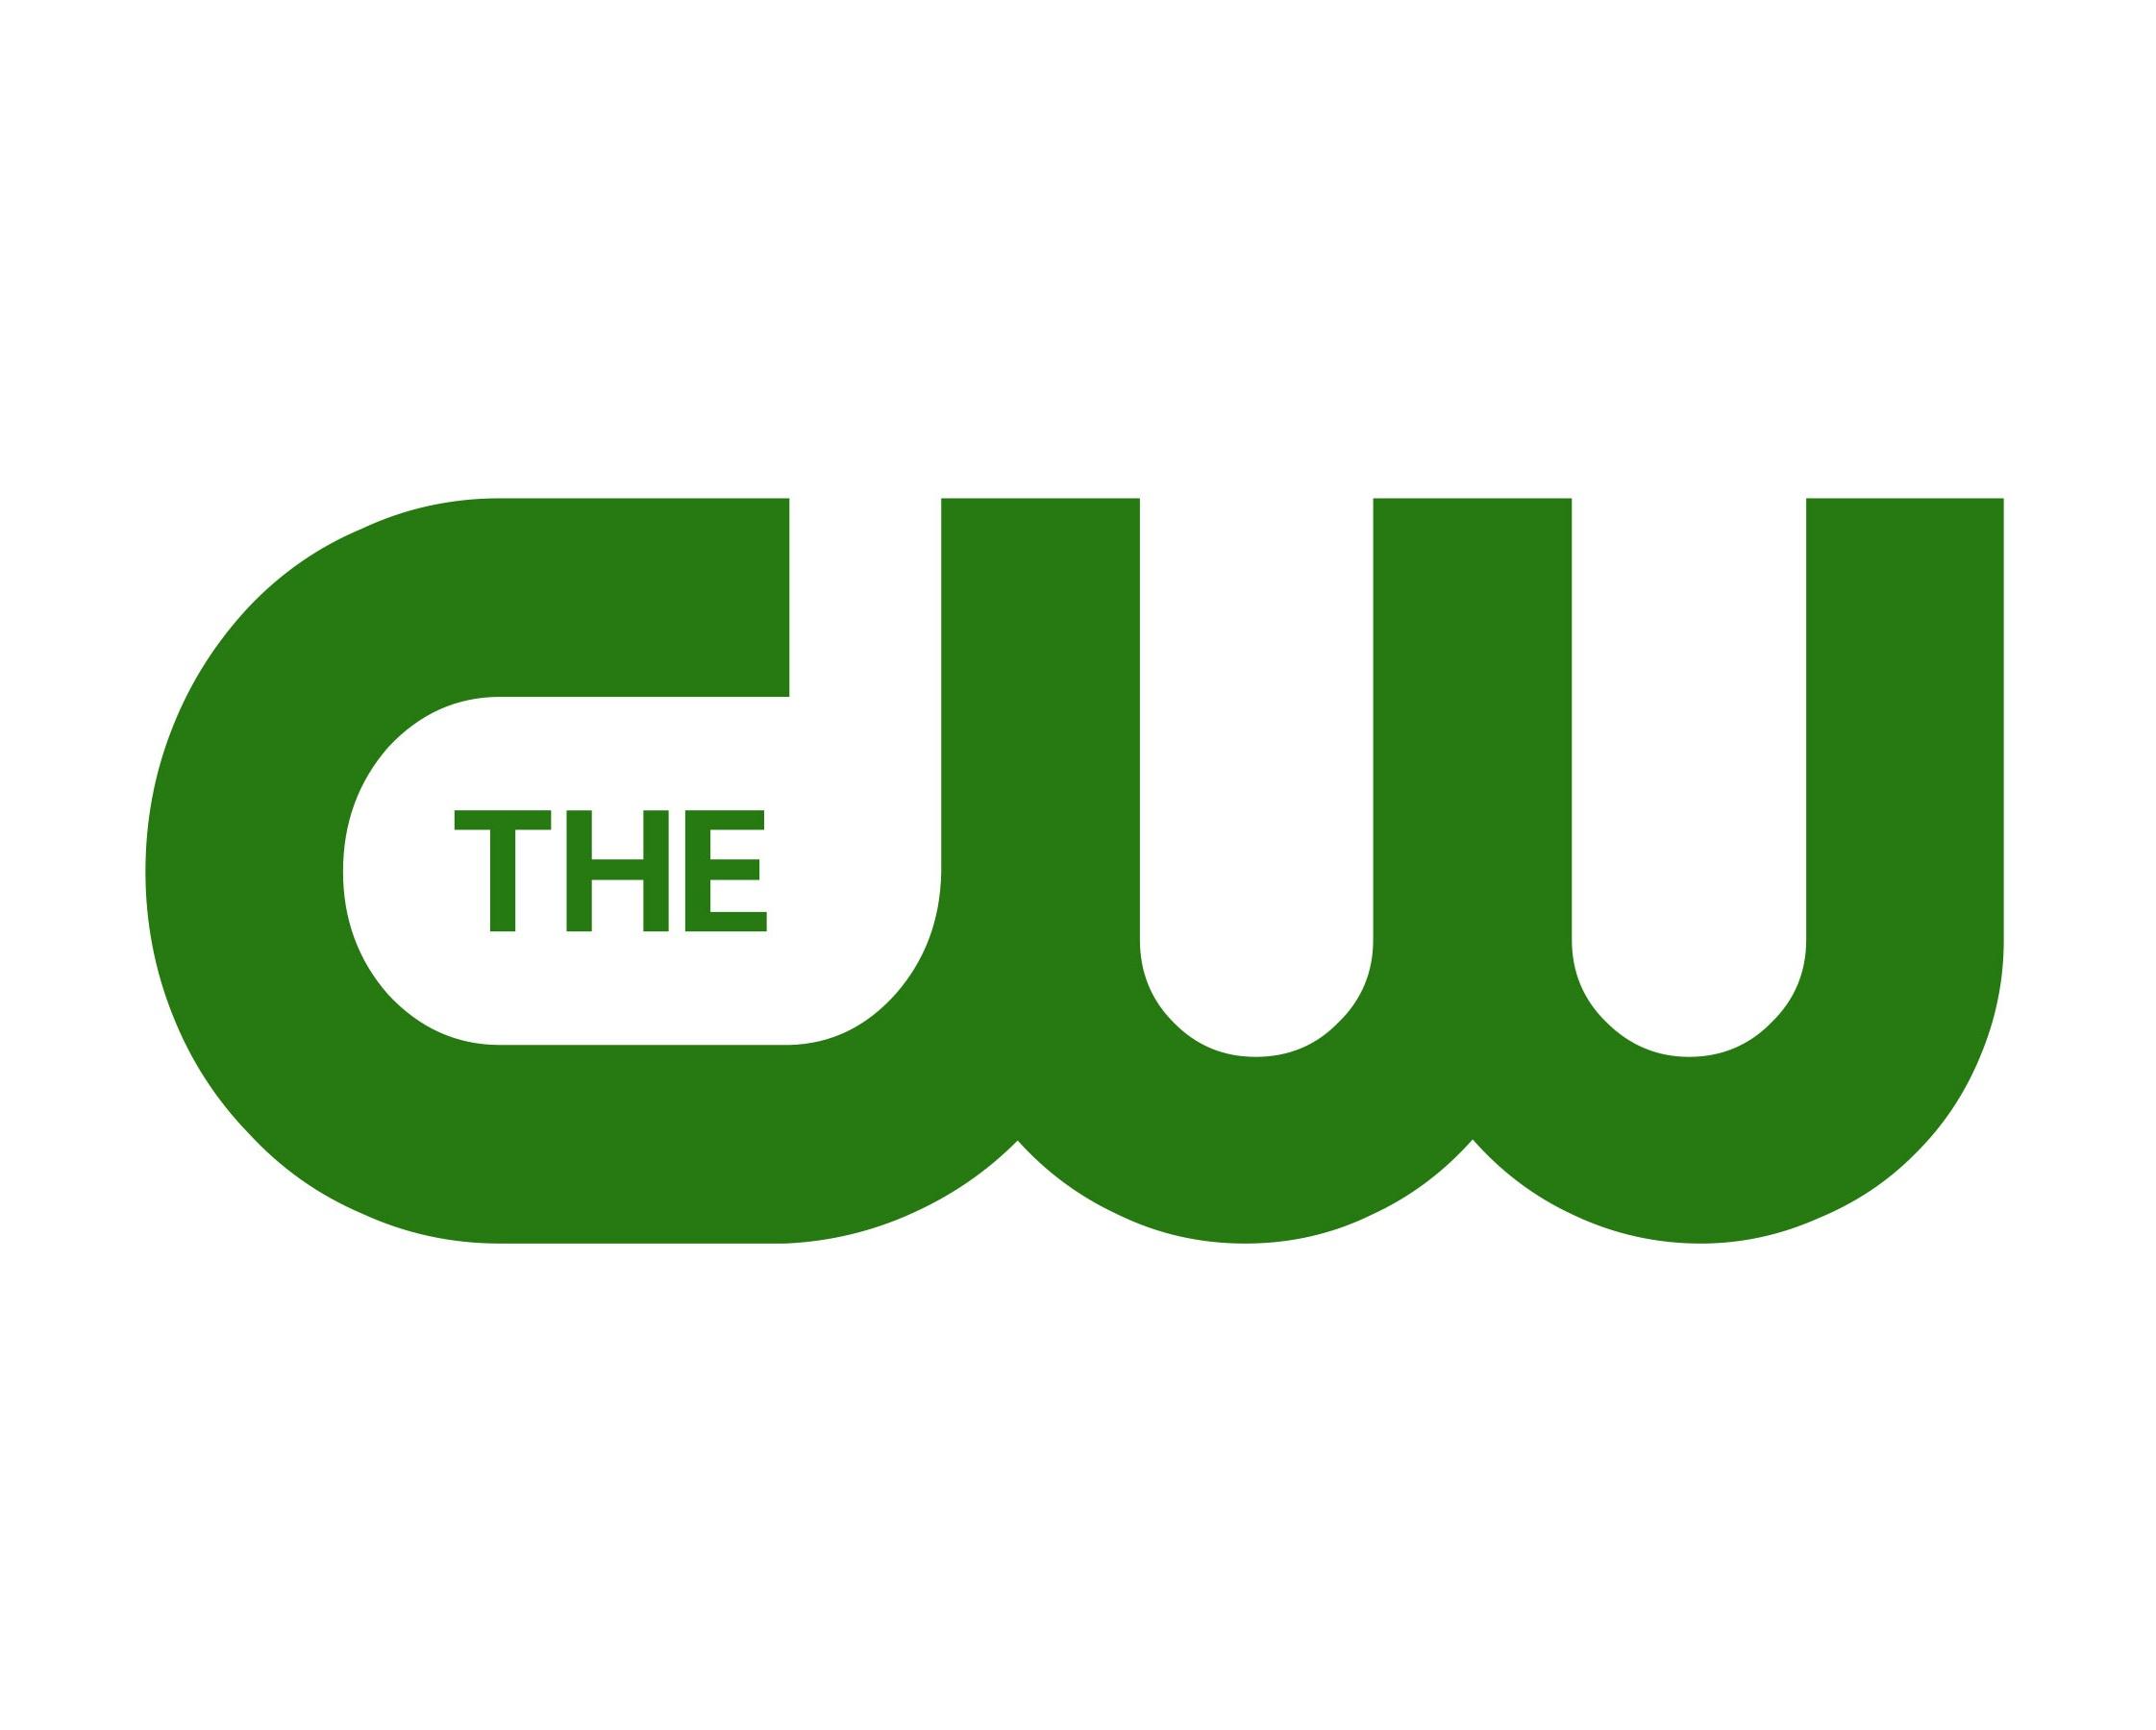 the-cw-logo.jpg